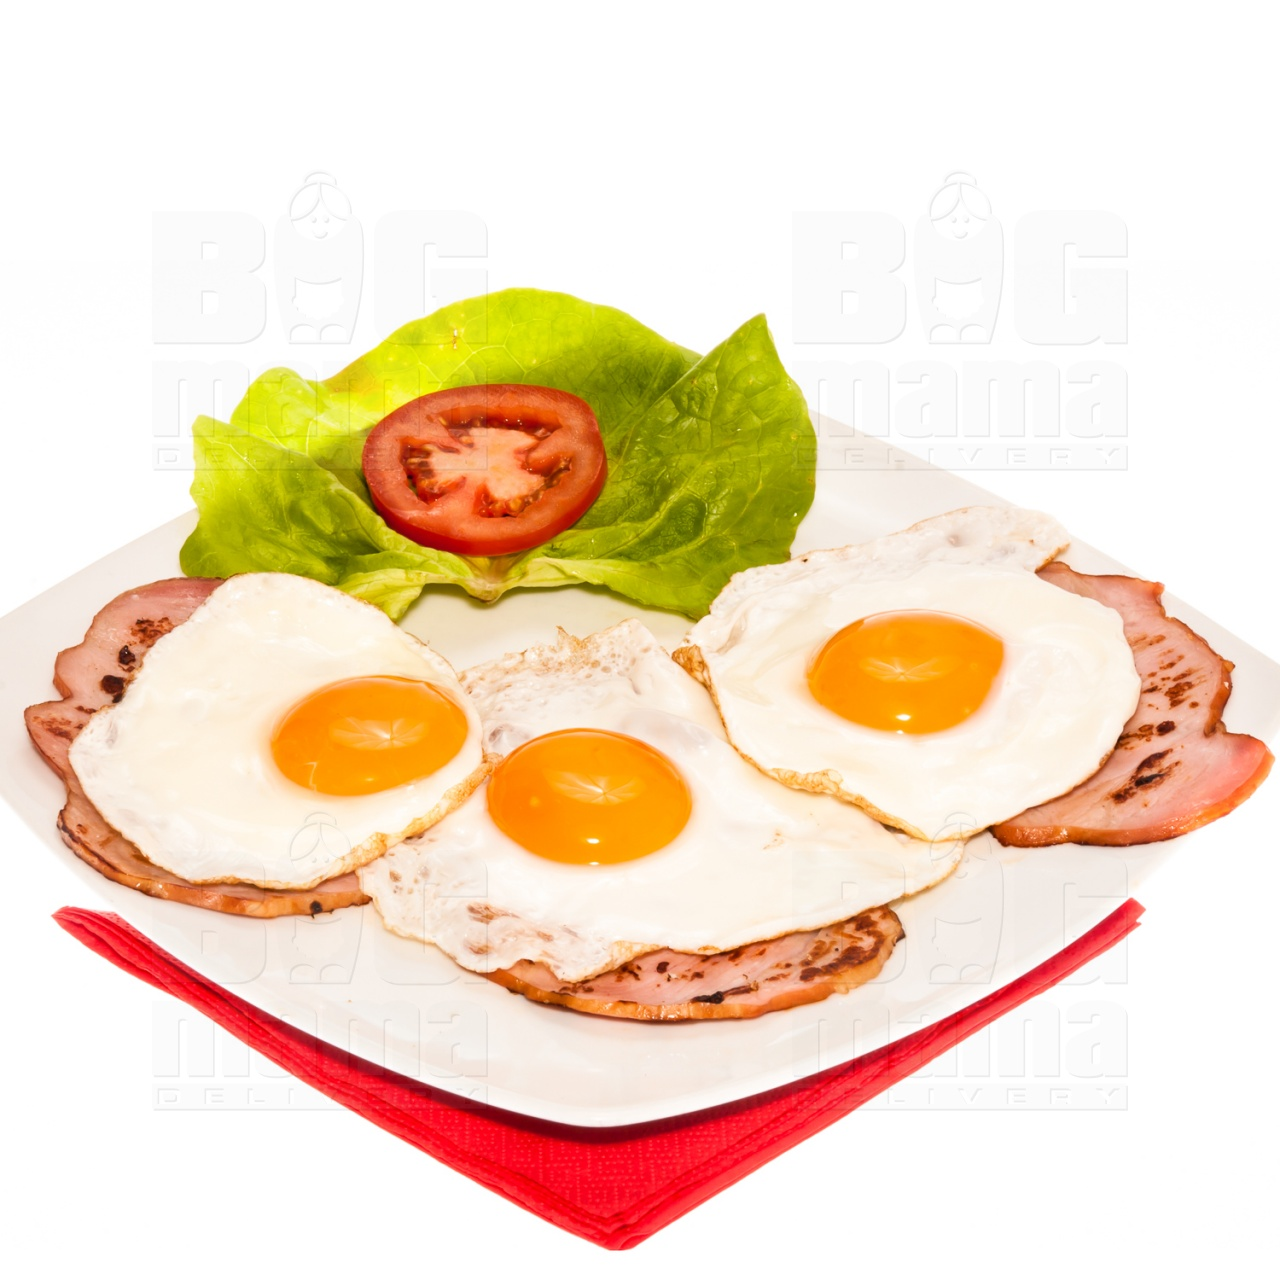 Product #134 image - Ham & eggs